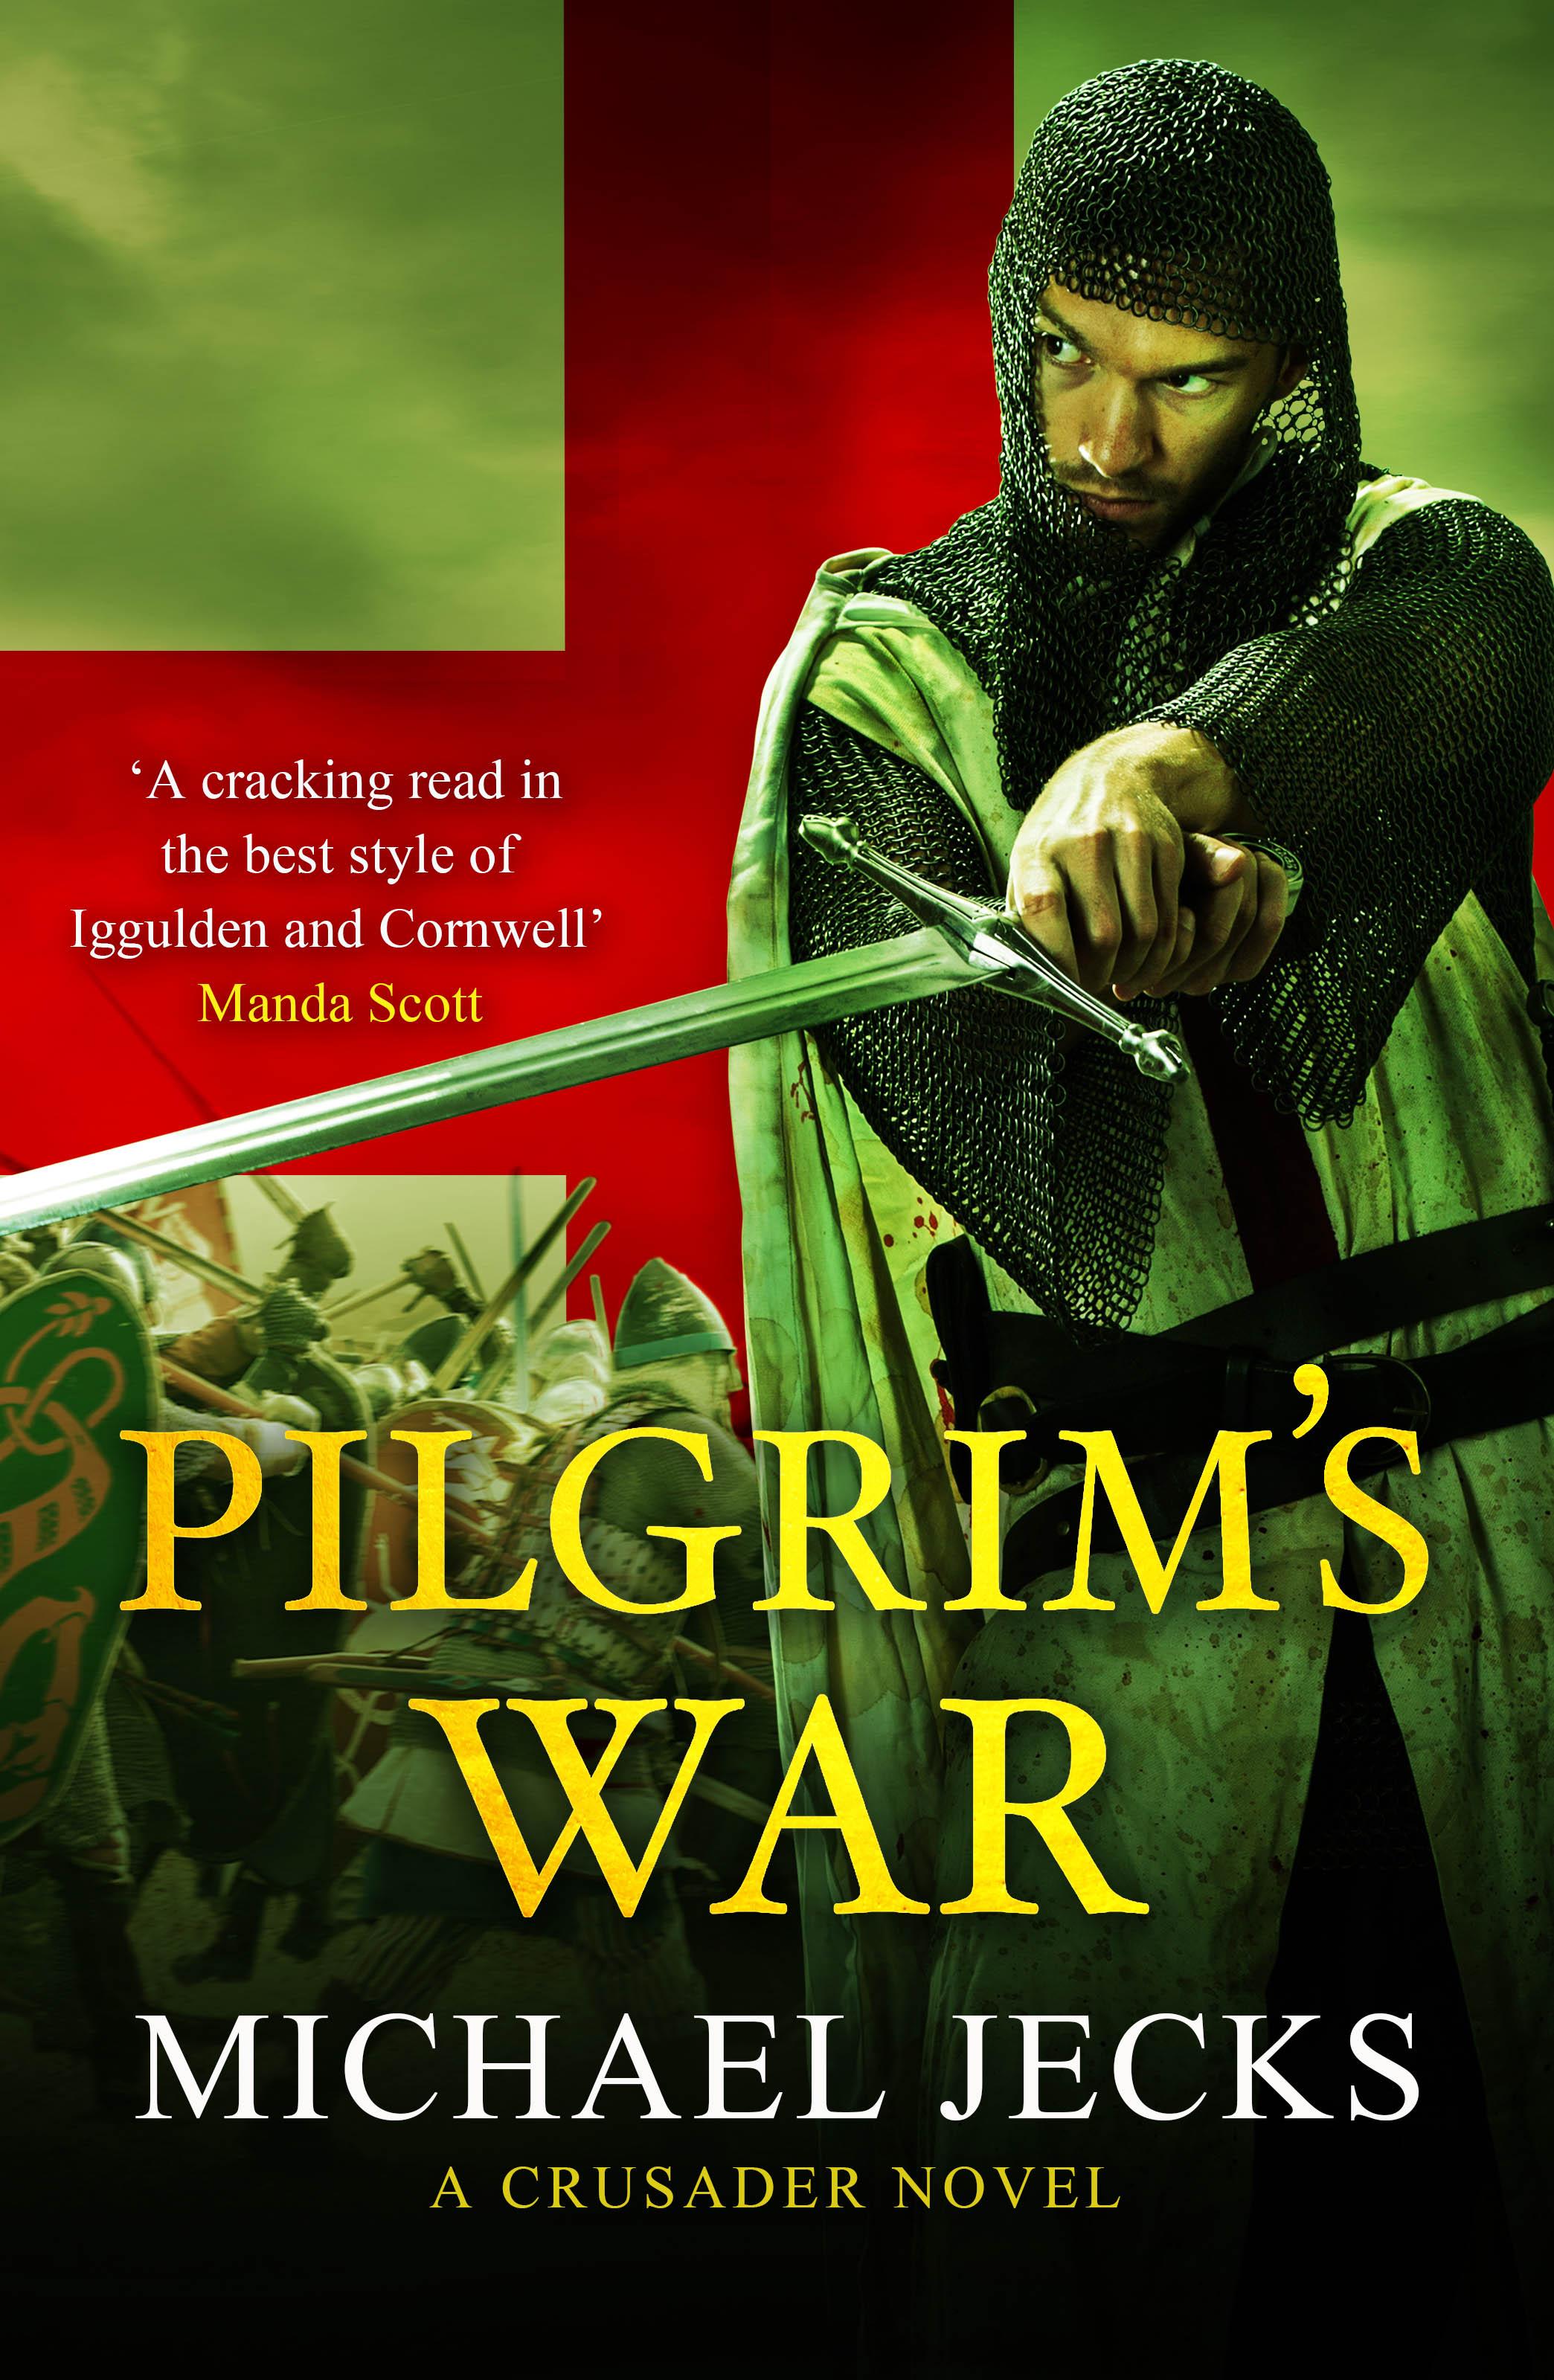 pilgrims war jecks b